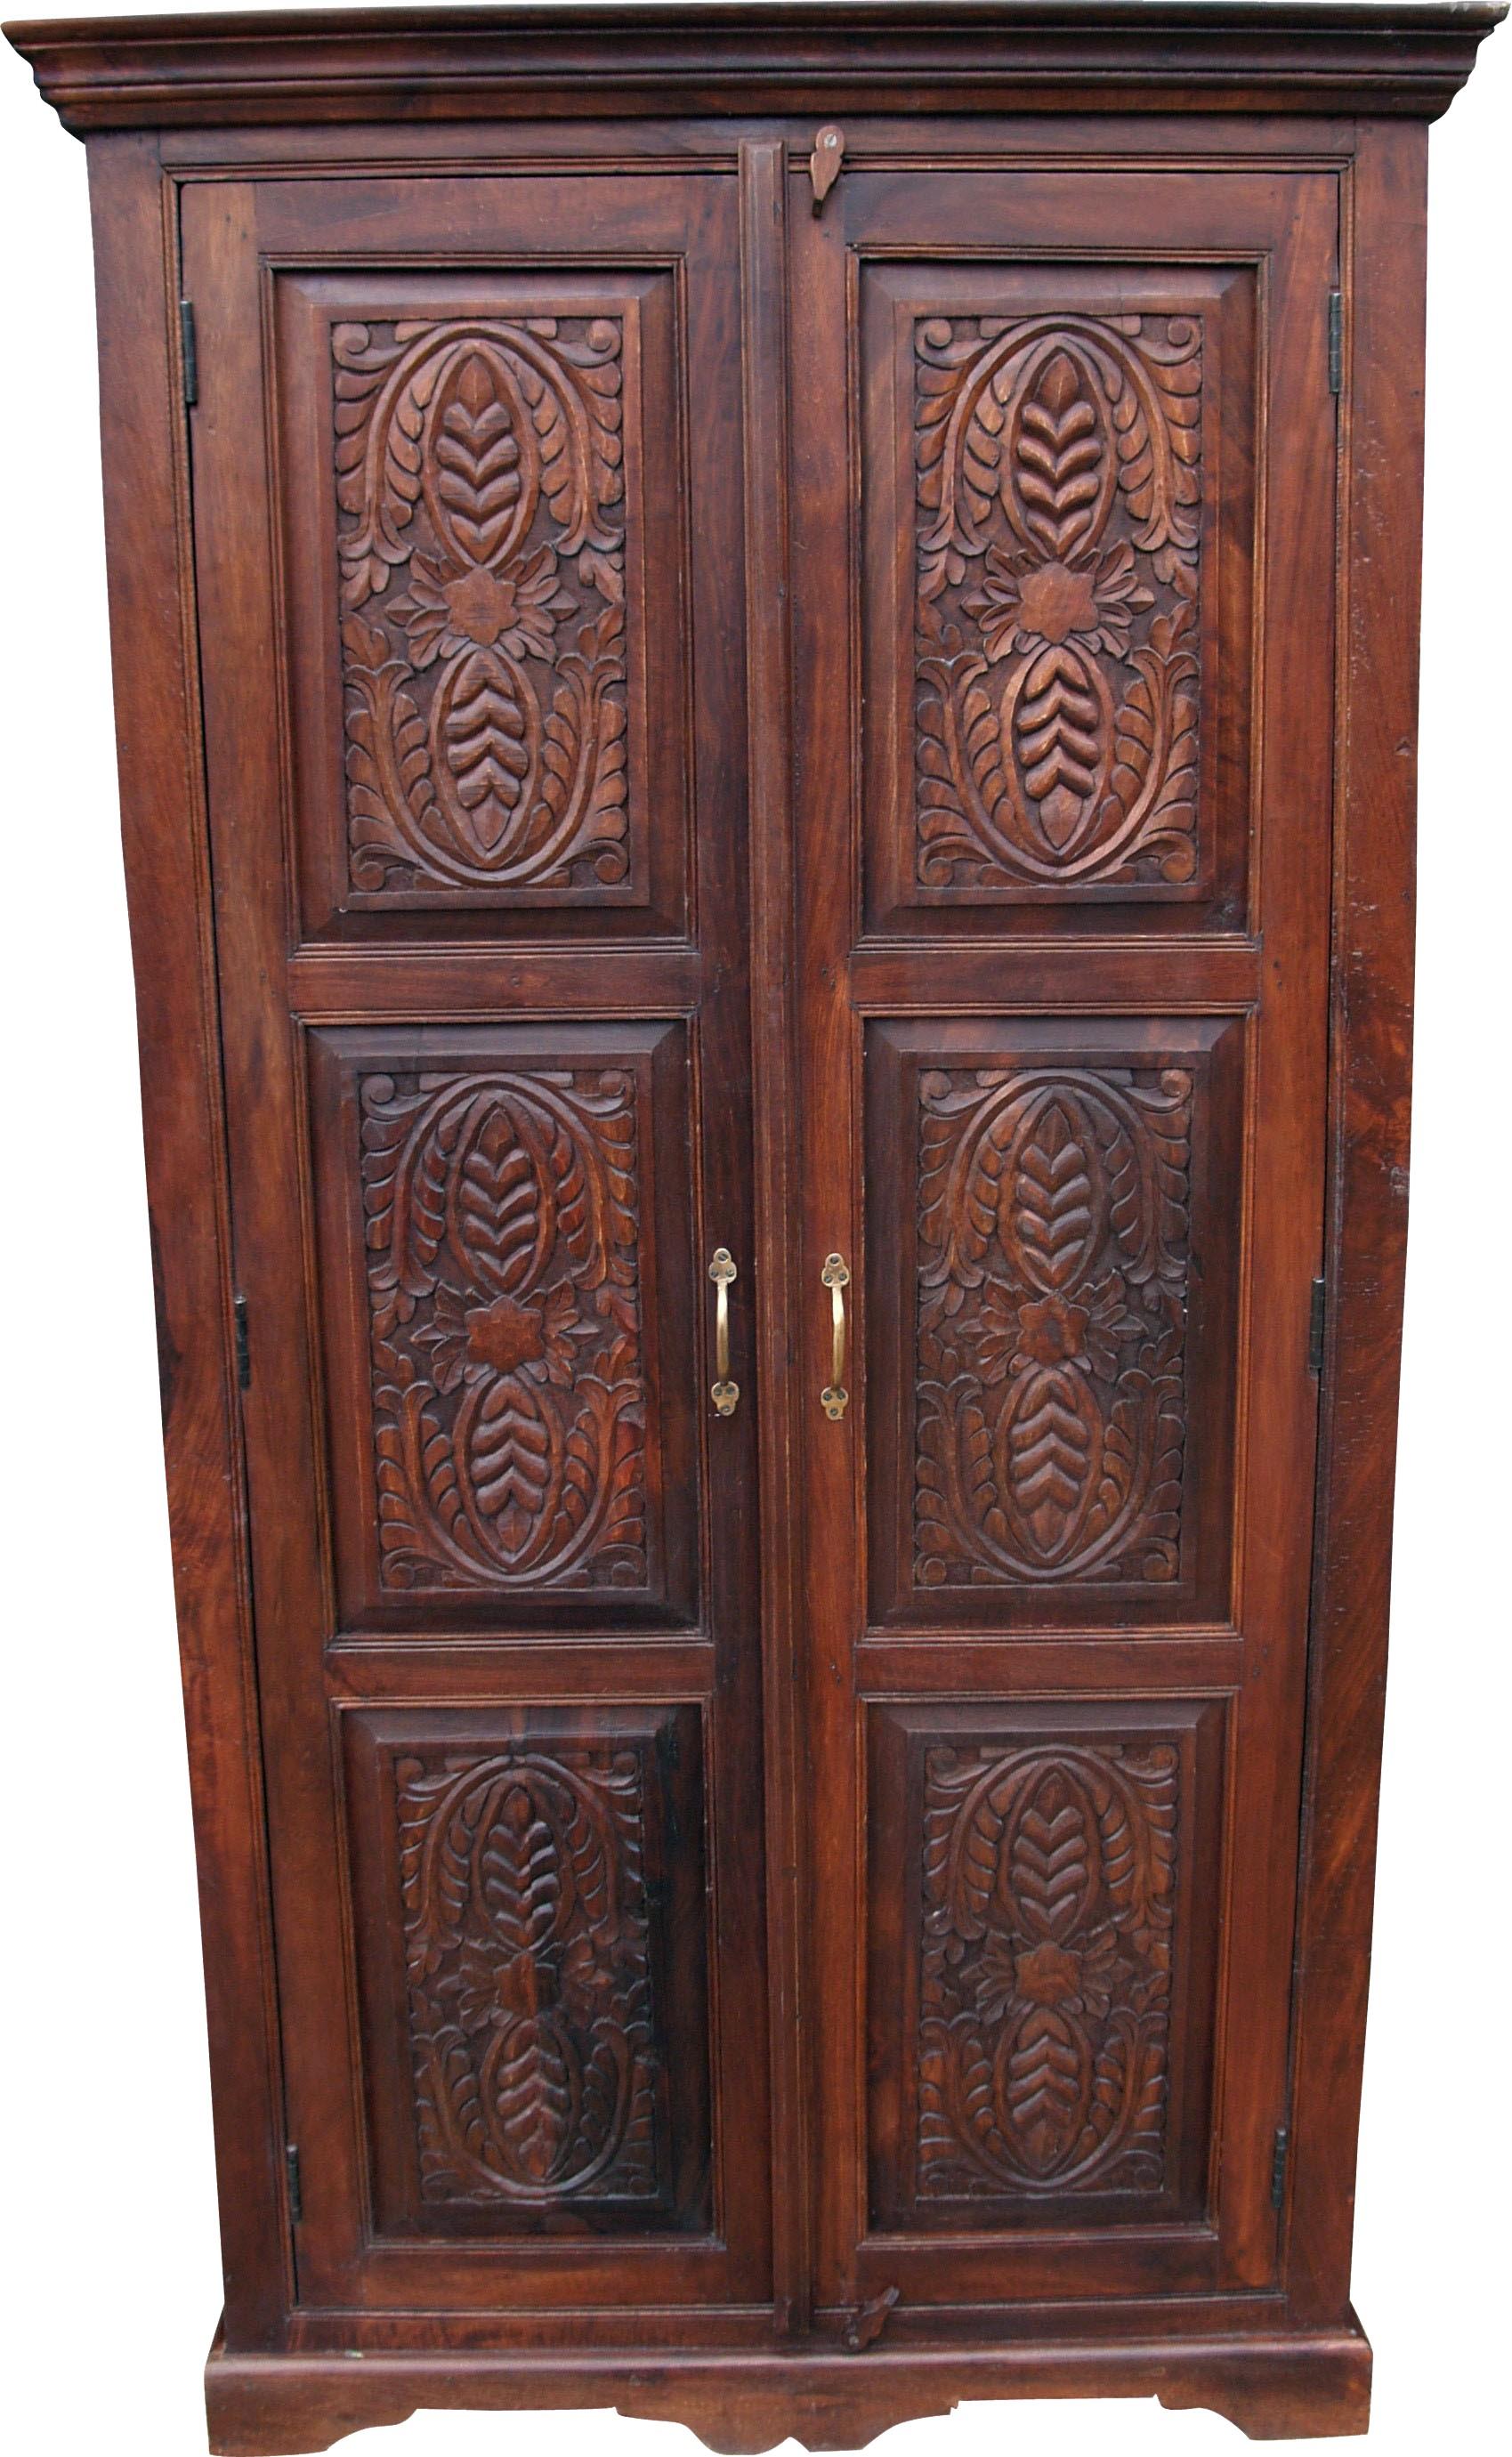 kleiderschrank im kolonialstil kleiderstange 1. Black Bedroom Furniture Sets. Home Design Ideas